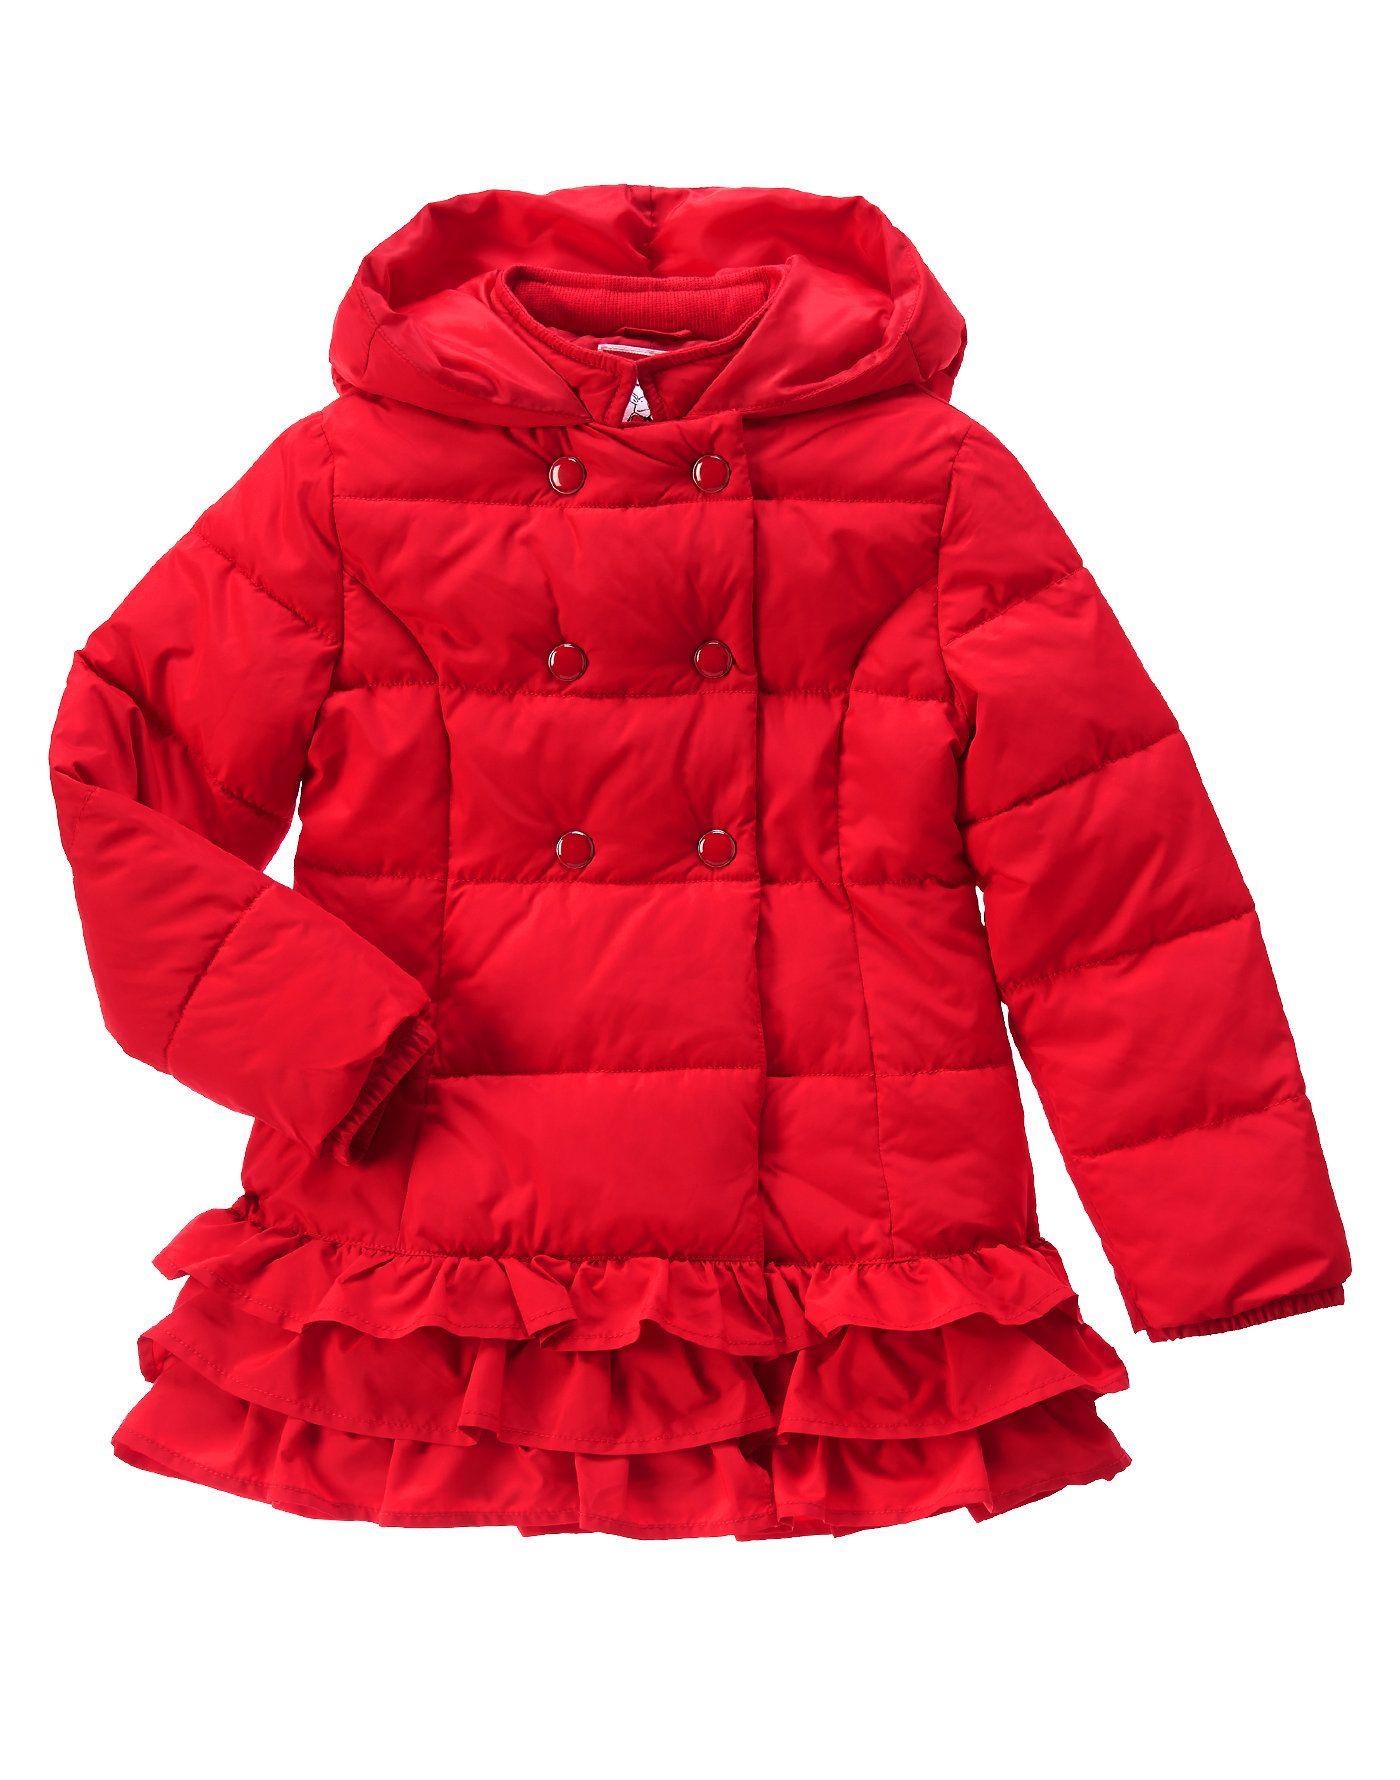 5394b4e1fed43 Olivia Ruffle Puffer Jacket at Gymboree